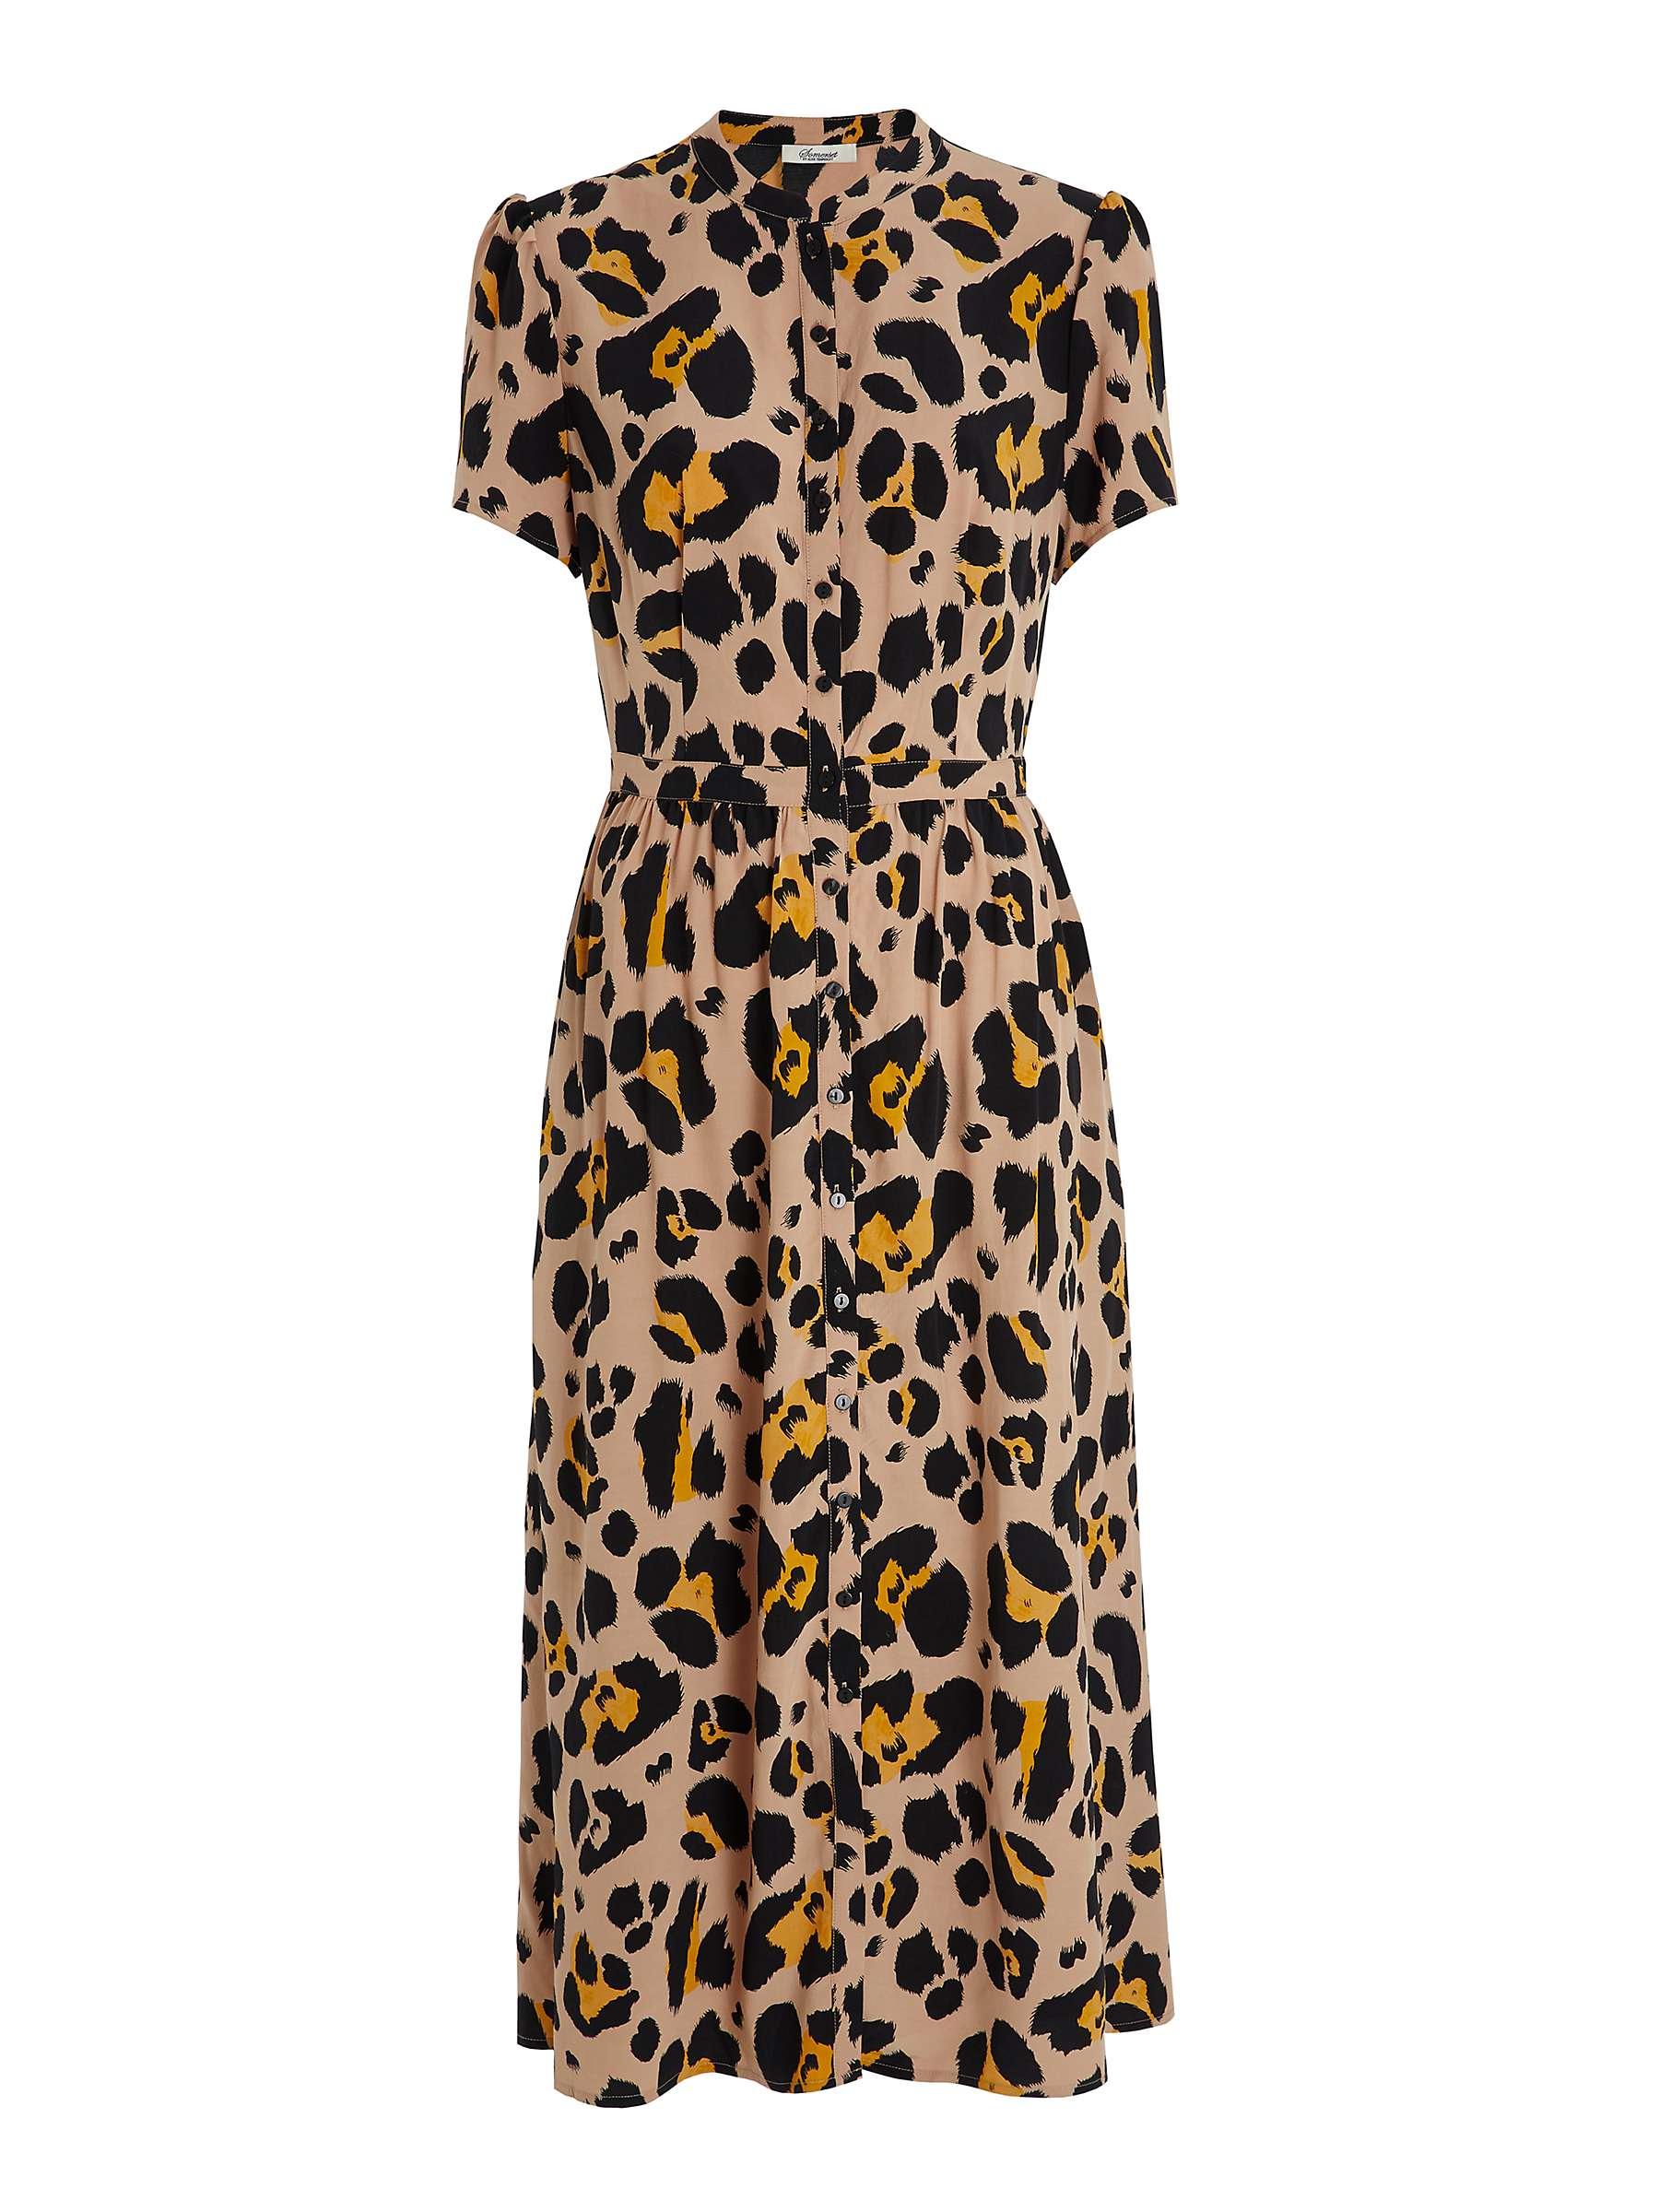 Ruth Langsford's leopard print dress